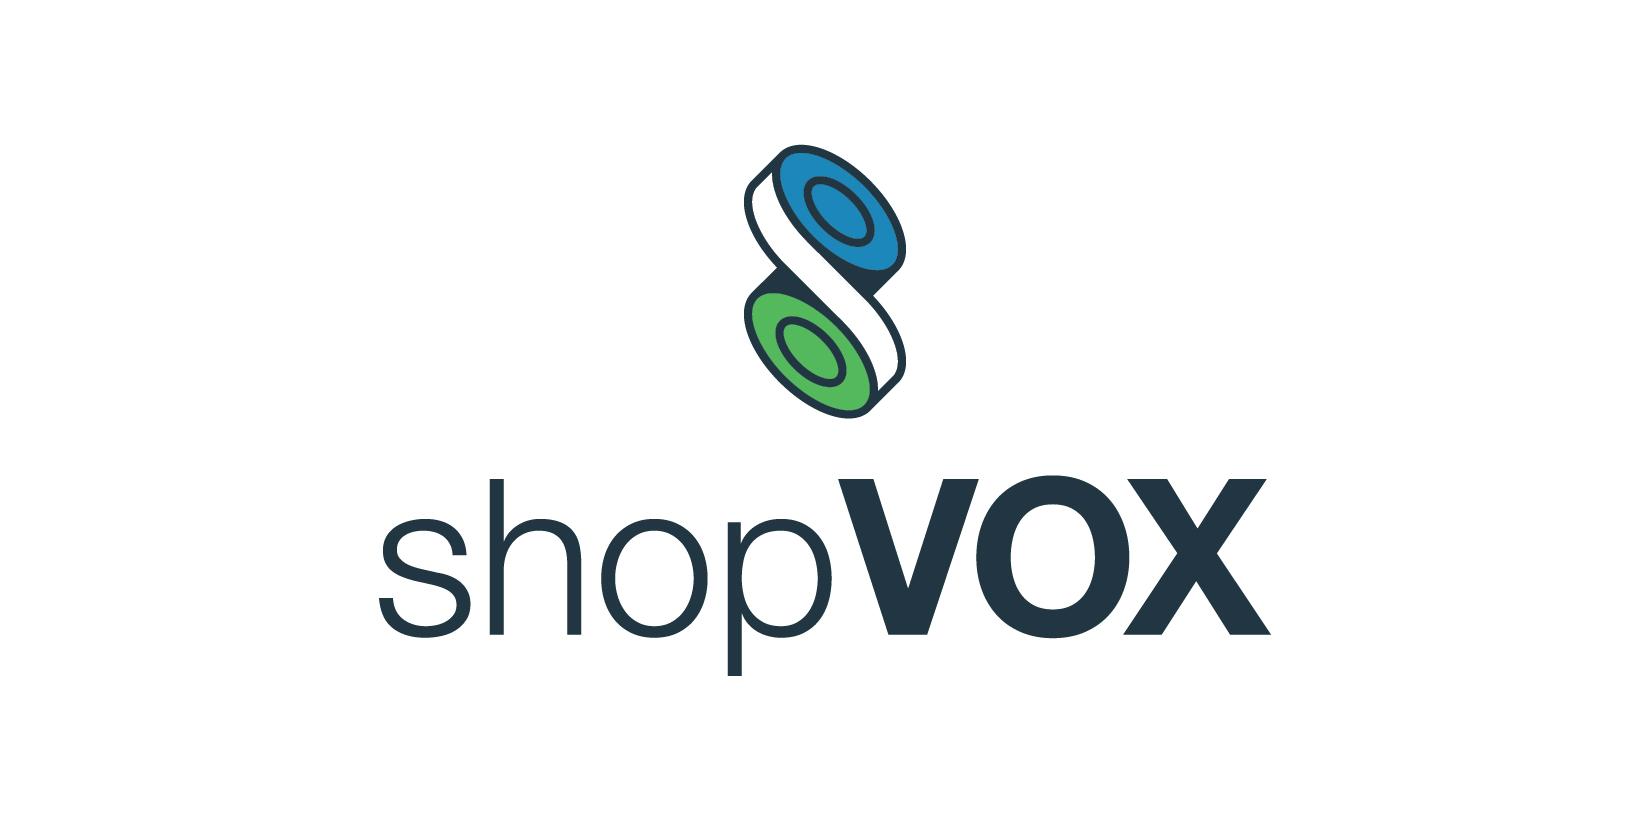 Shopvox